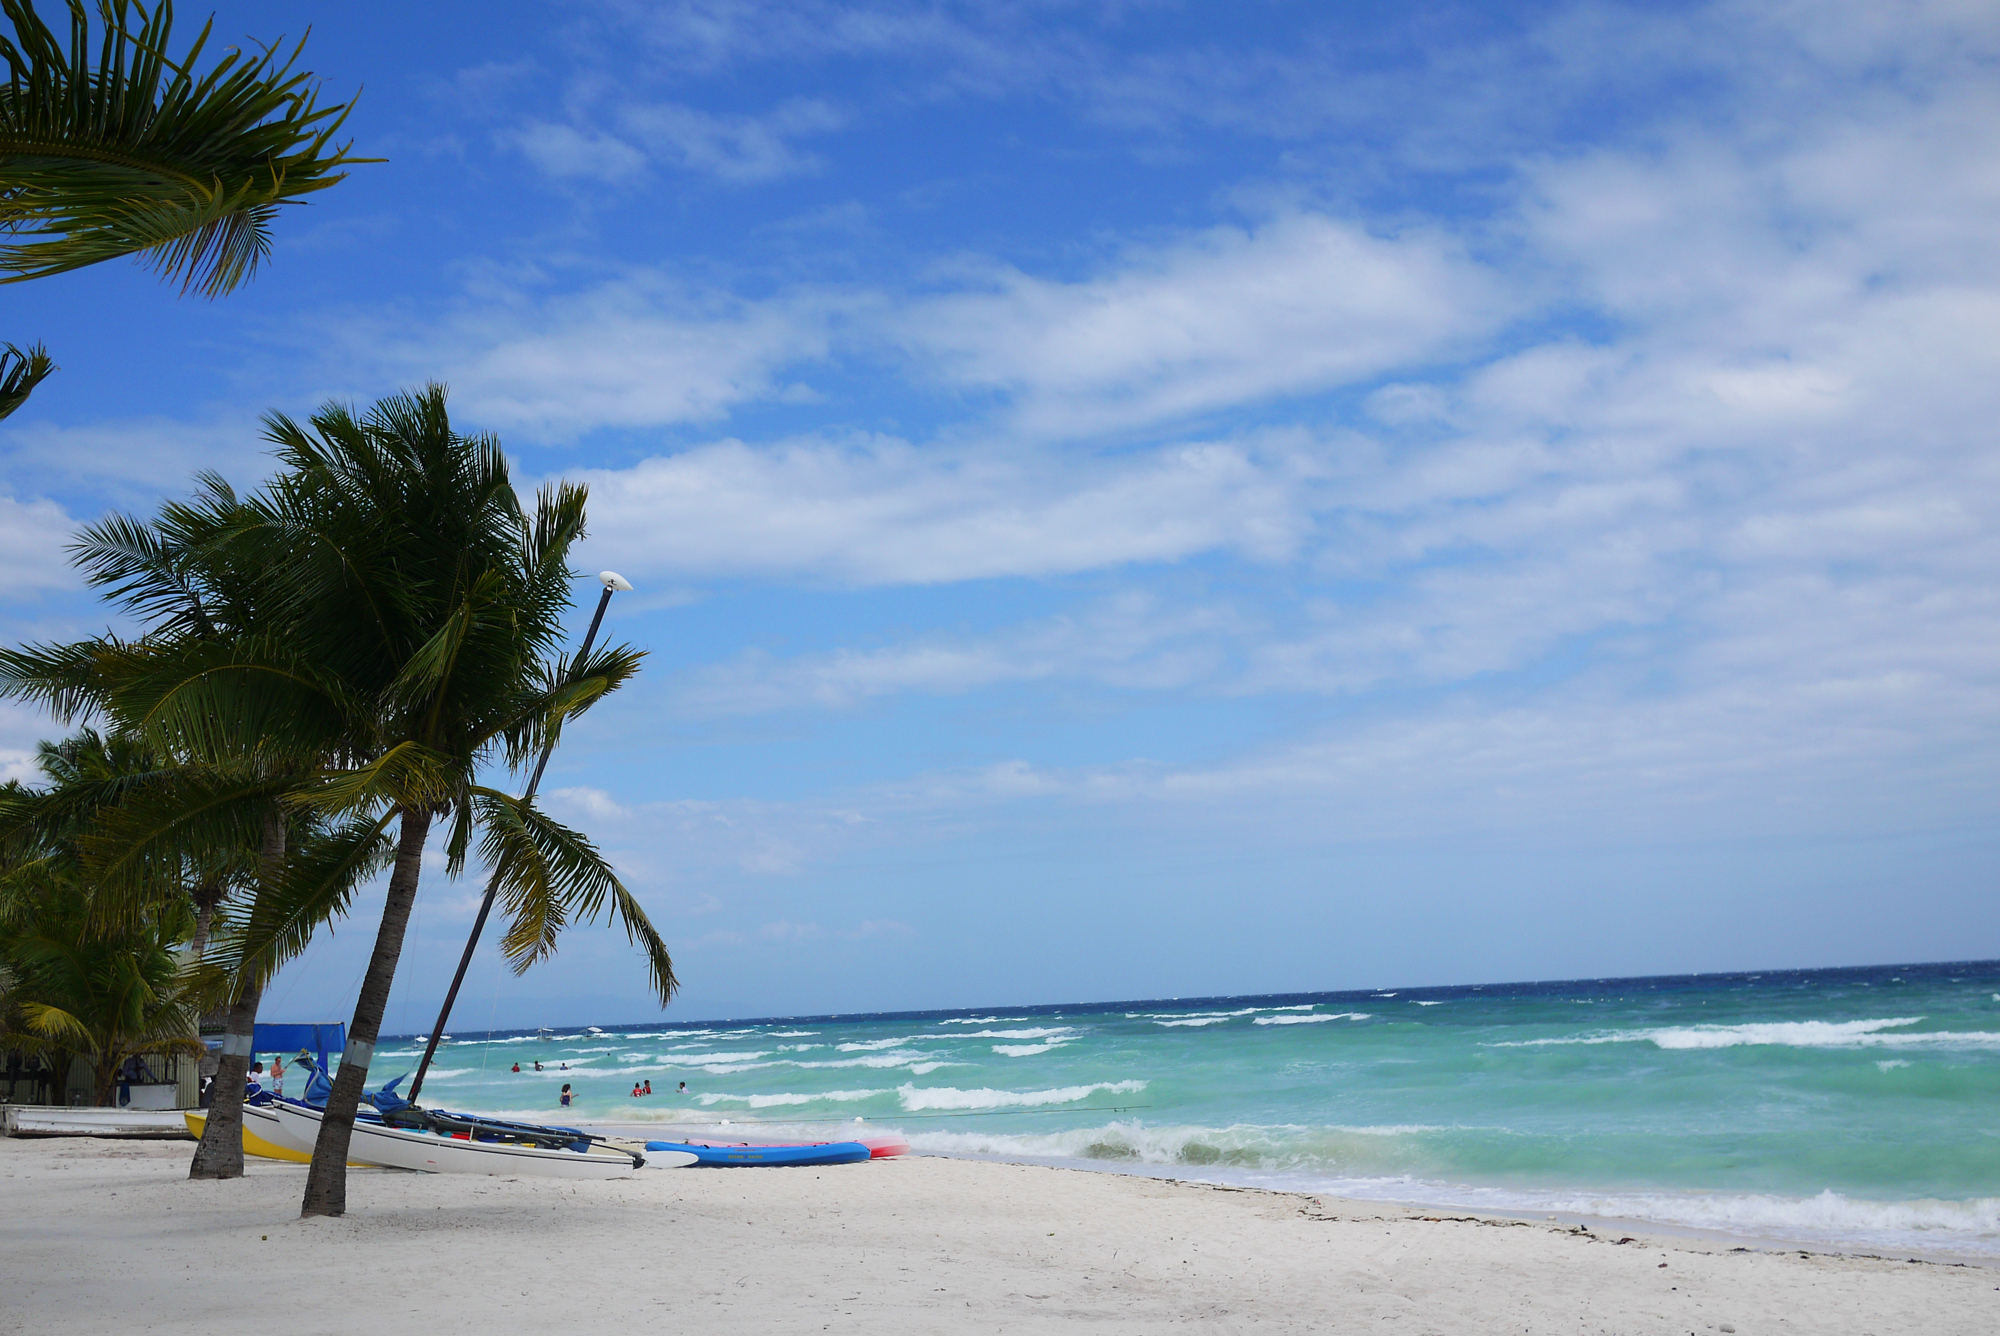 Dumaluan Beach Bohol